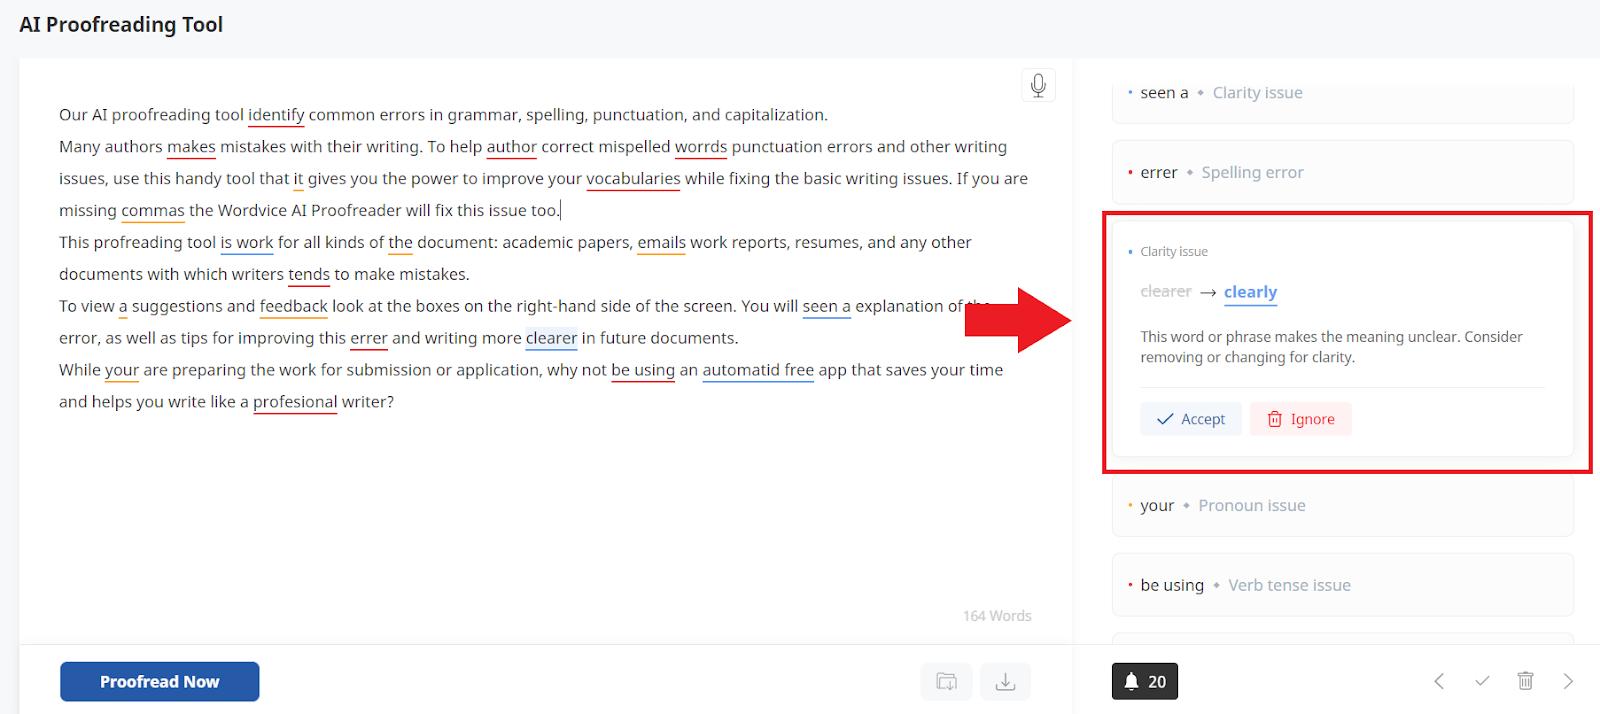 ai proofreading tool, suggestion box